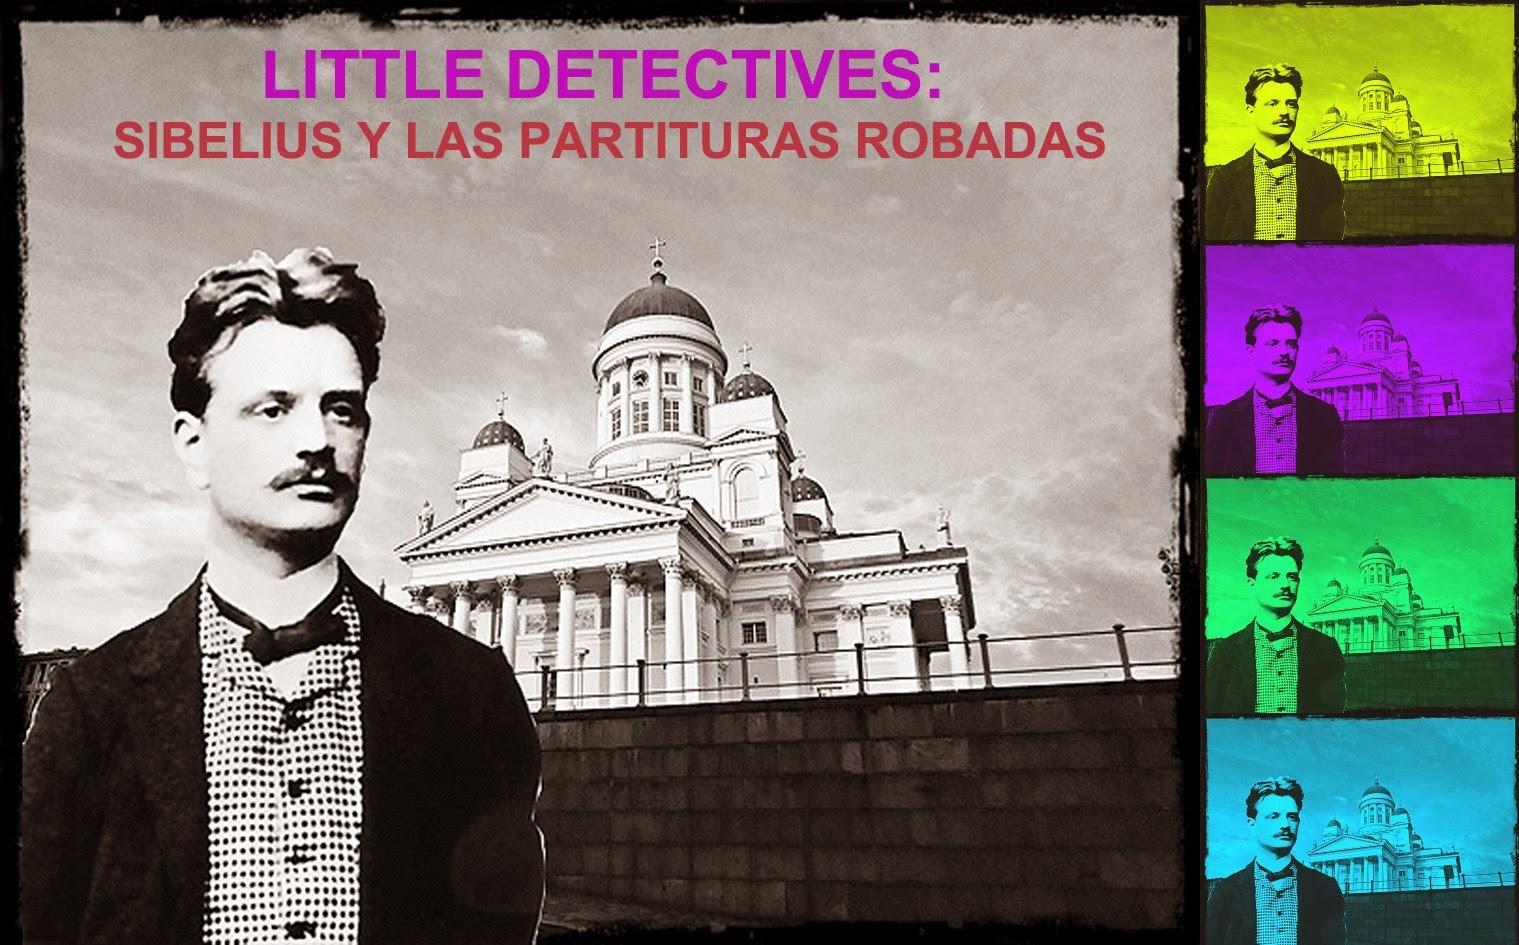 http://littledetectivessibelius.blogspot.com.es/